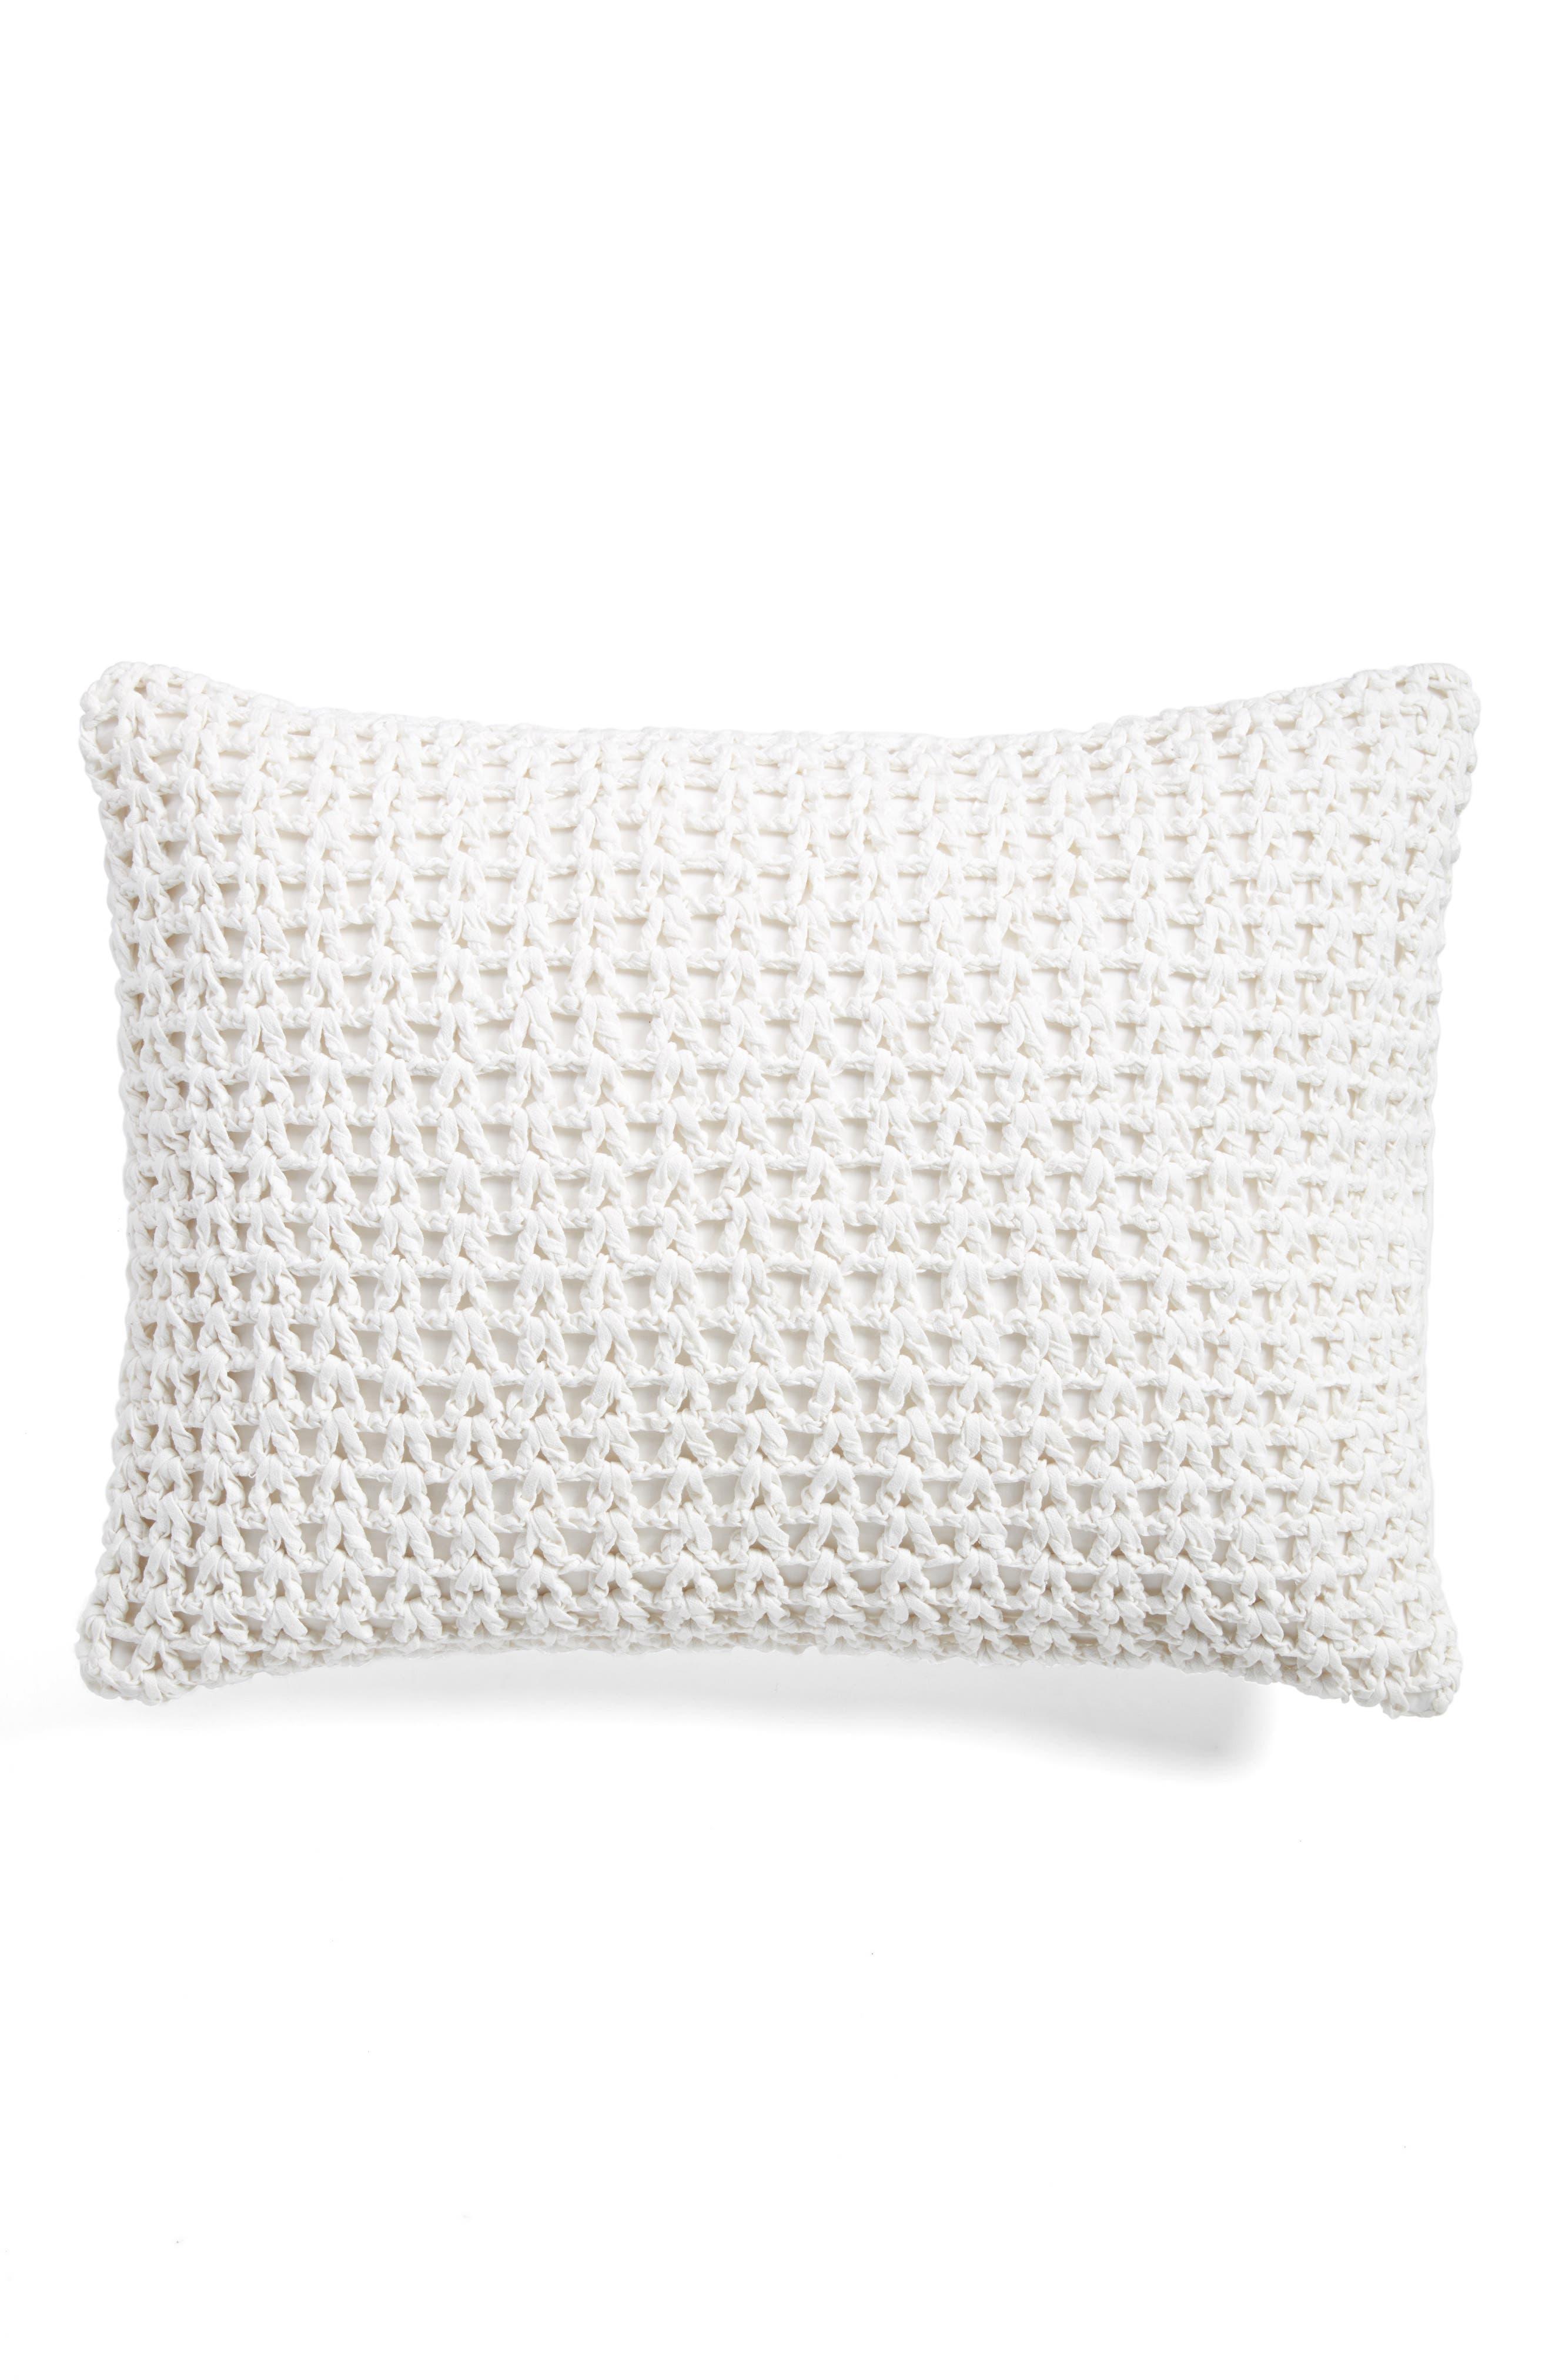 Lux Marble Shibori Breakfast Accent Pillow,                         Main,                         color, 100